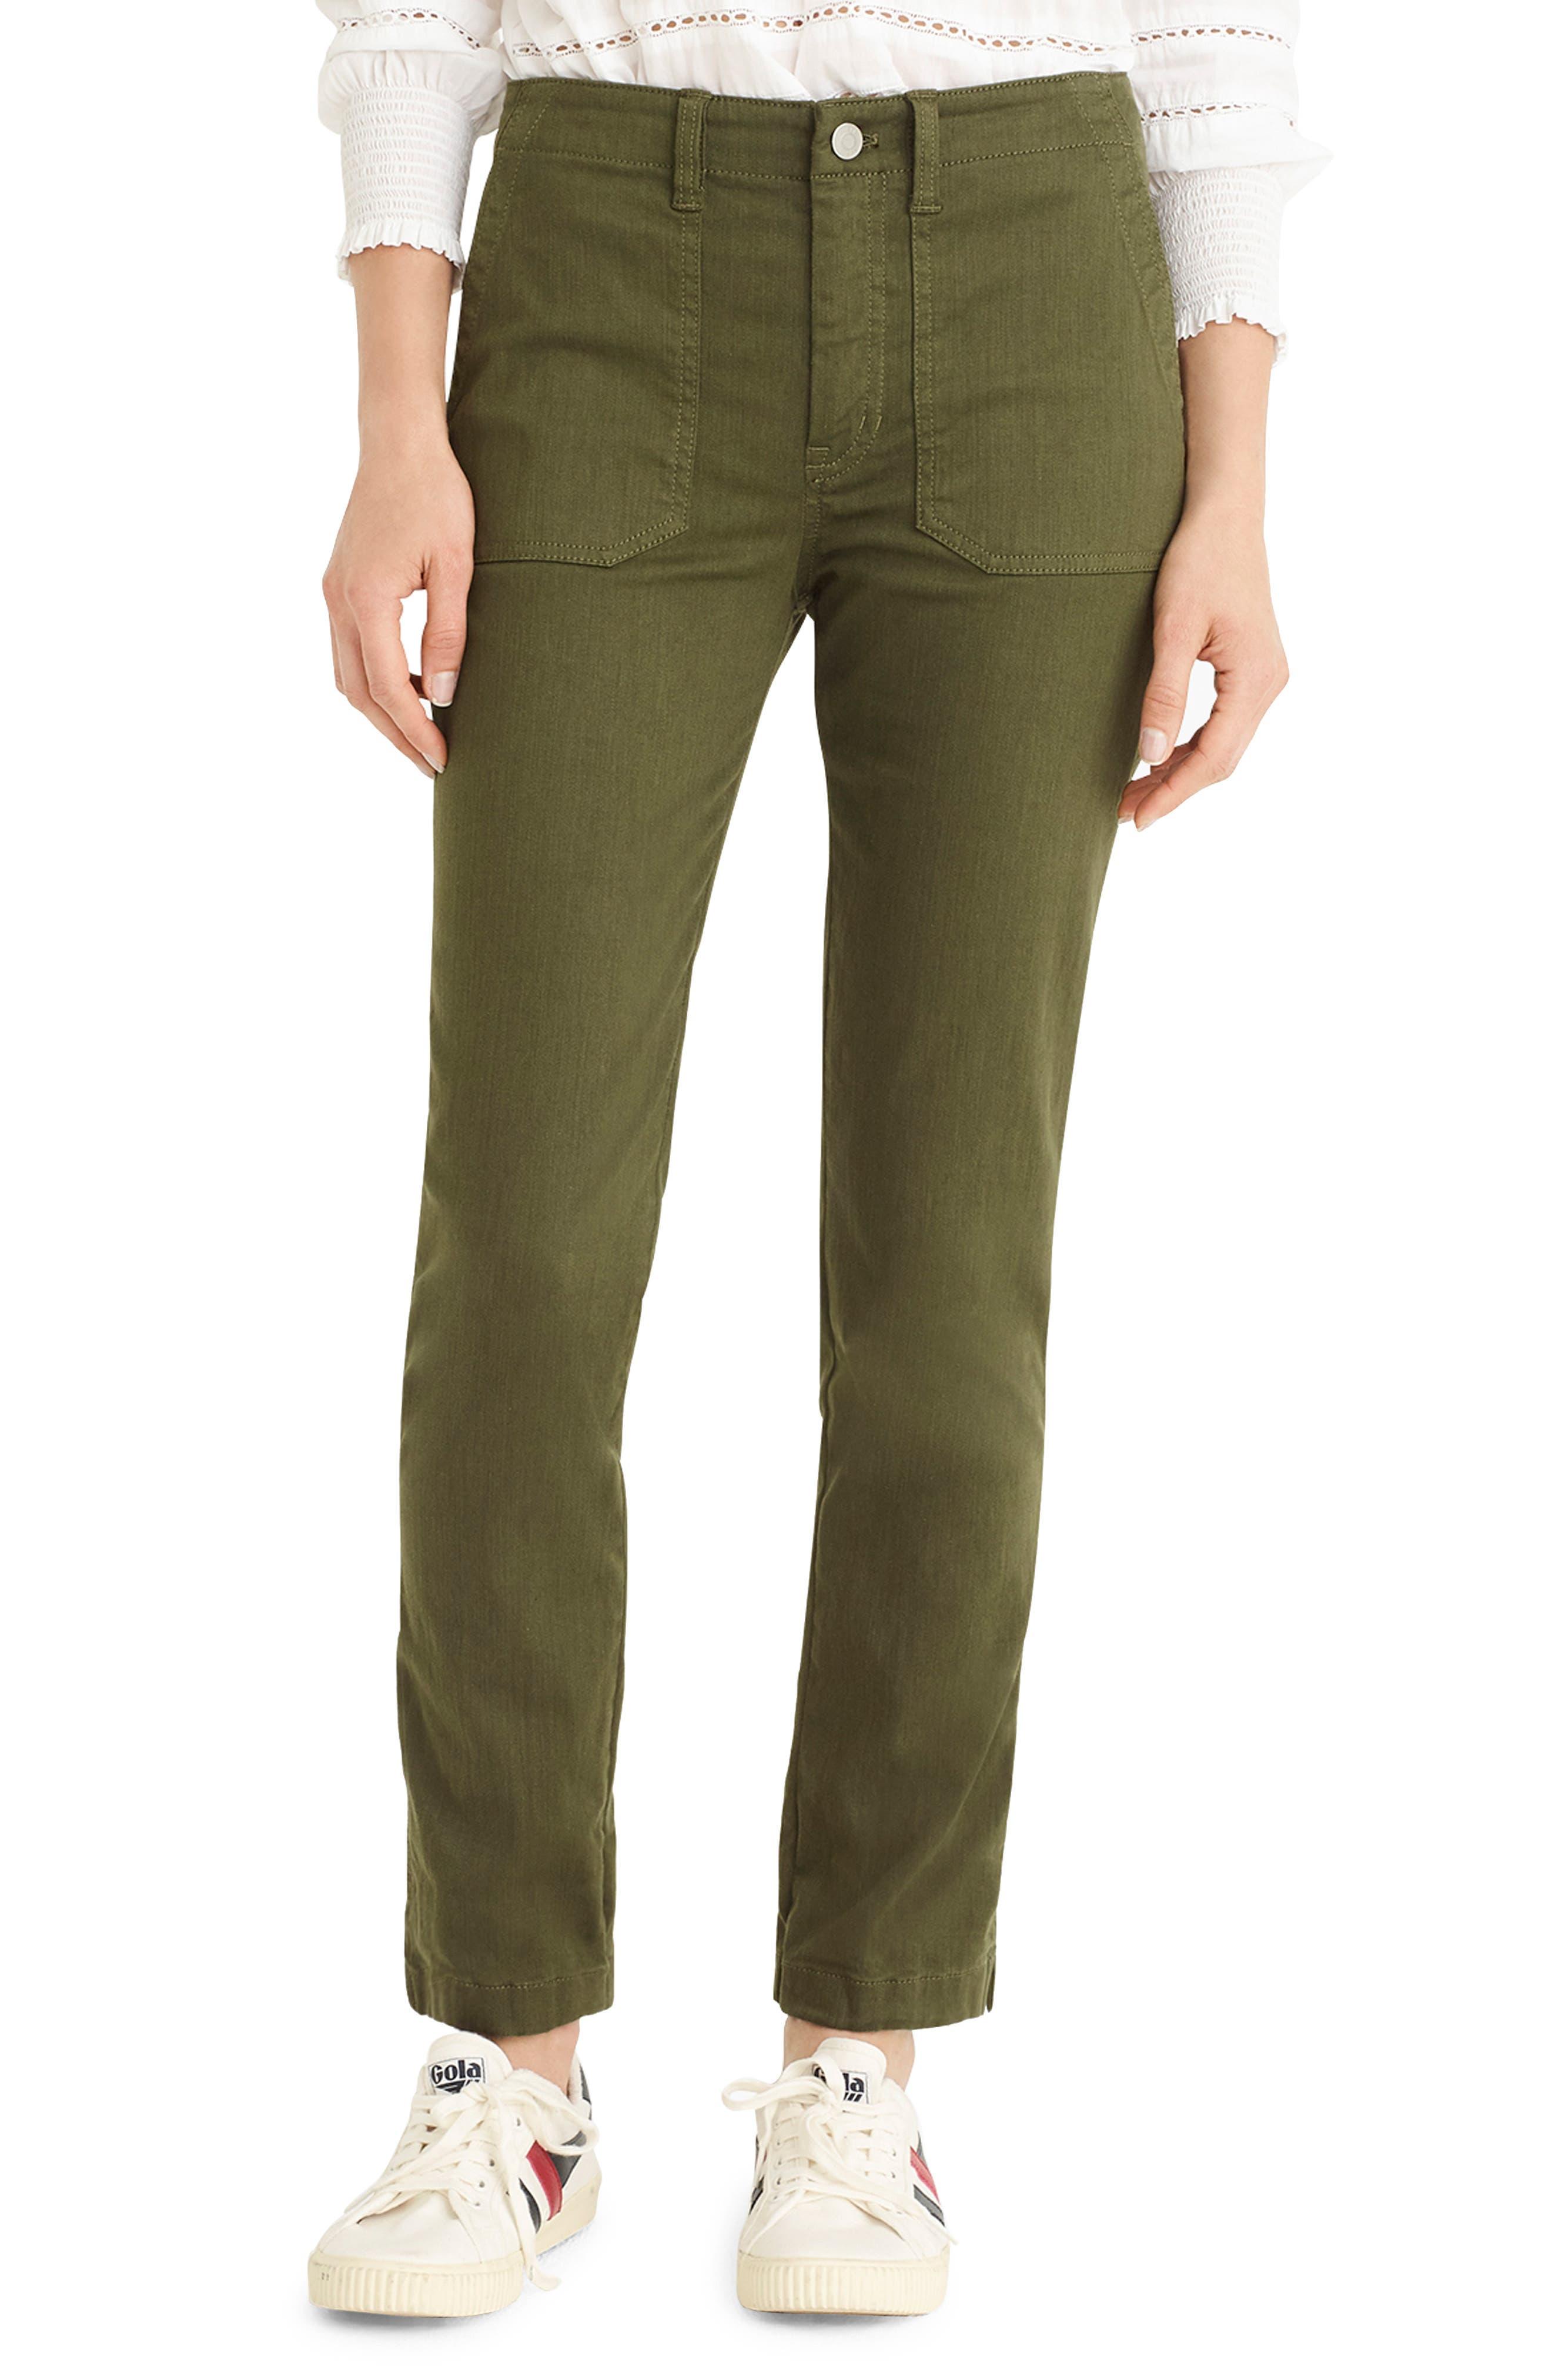 Petite J.crew Slub Sateen Straight Leg Cargo Pants, 3P - Green